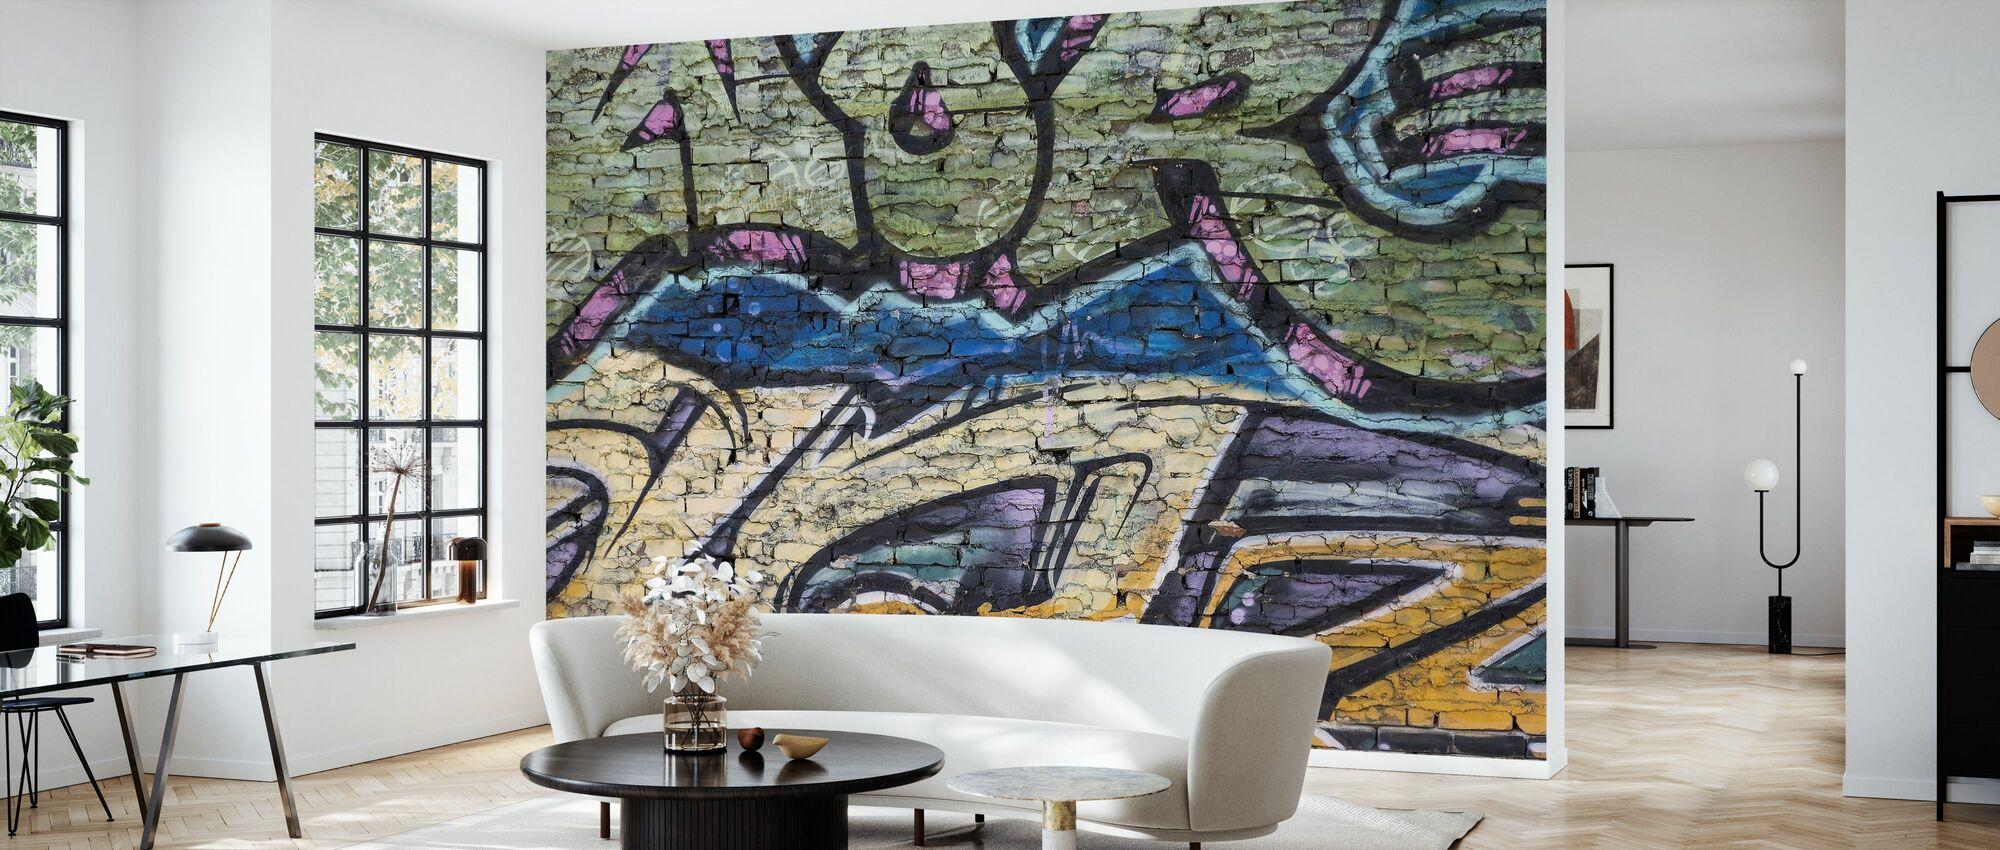 Street Art Wall - Wallpaper - Living Room